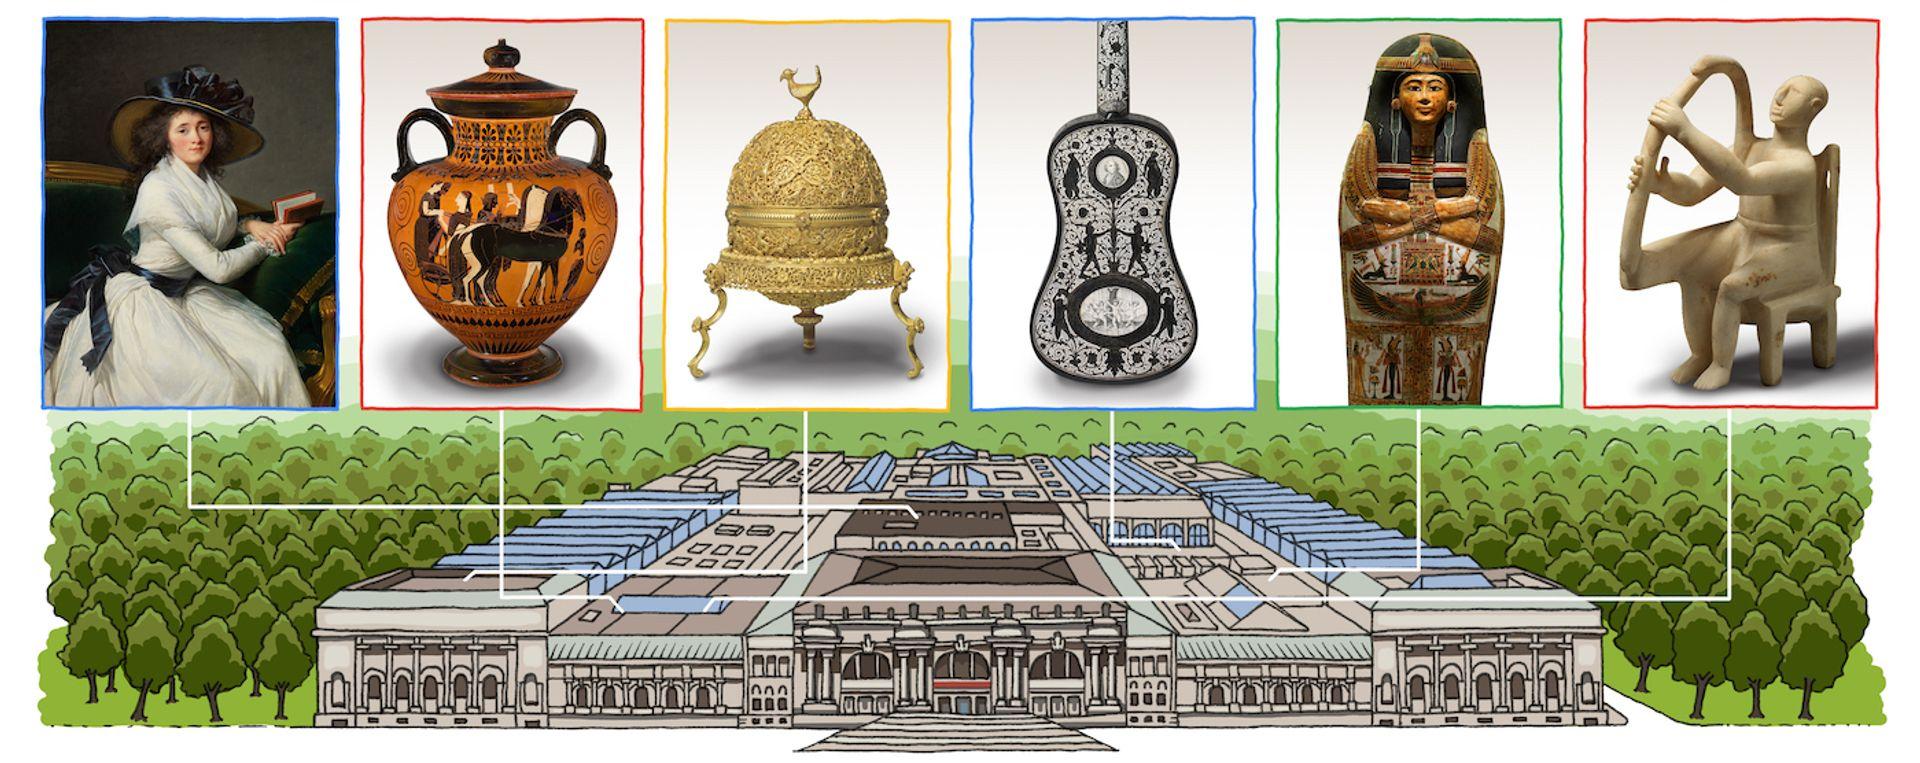 The Google Doodle celebrates the 151st anniversary of the Metropolitan Museum of Art Google Doodle